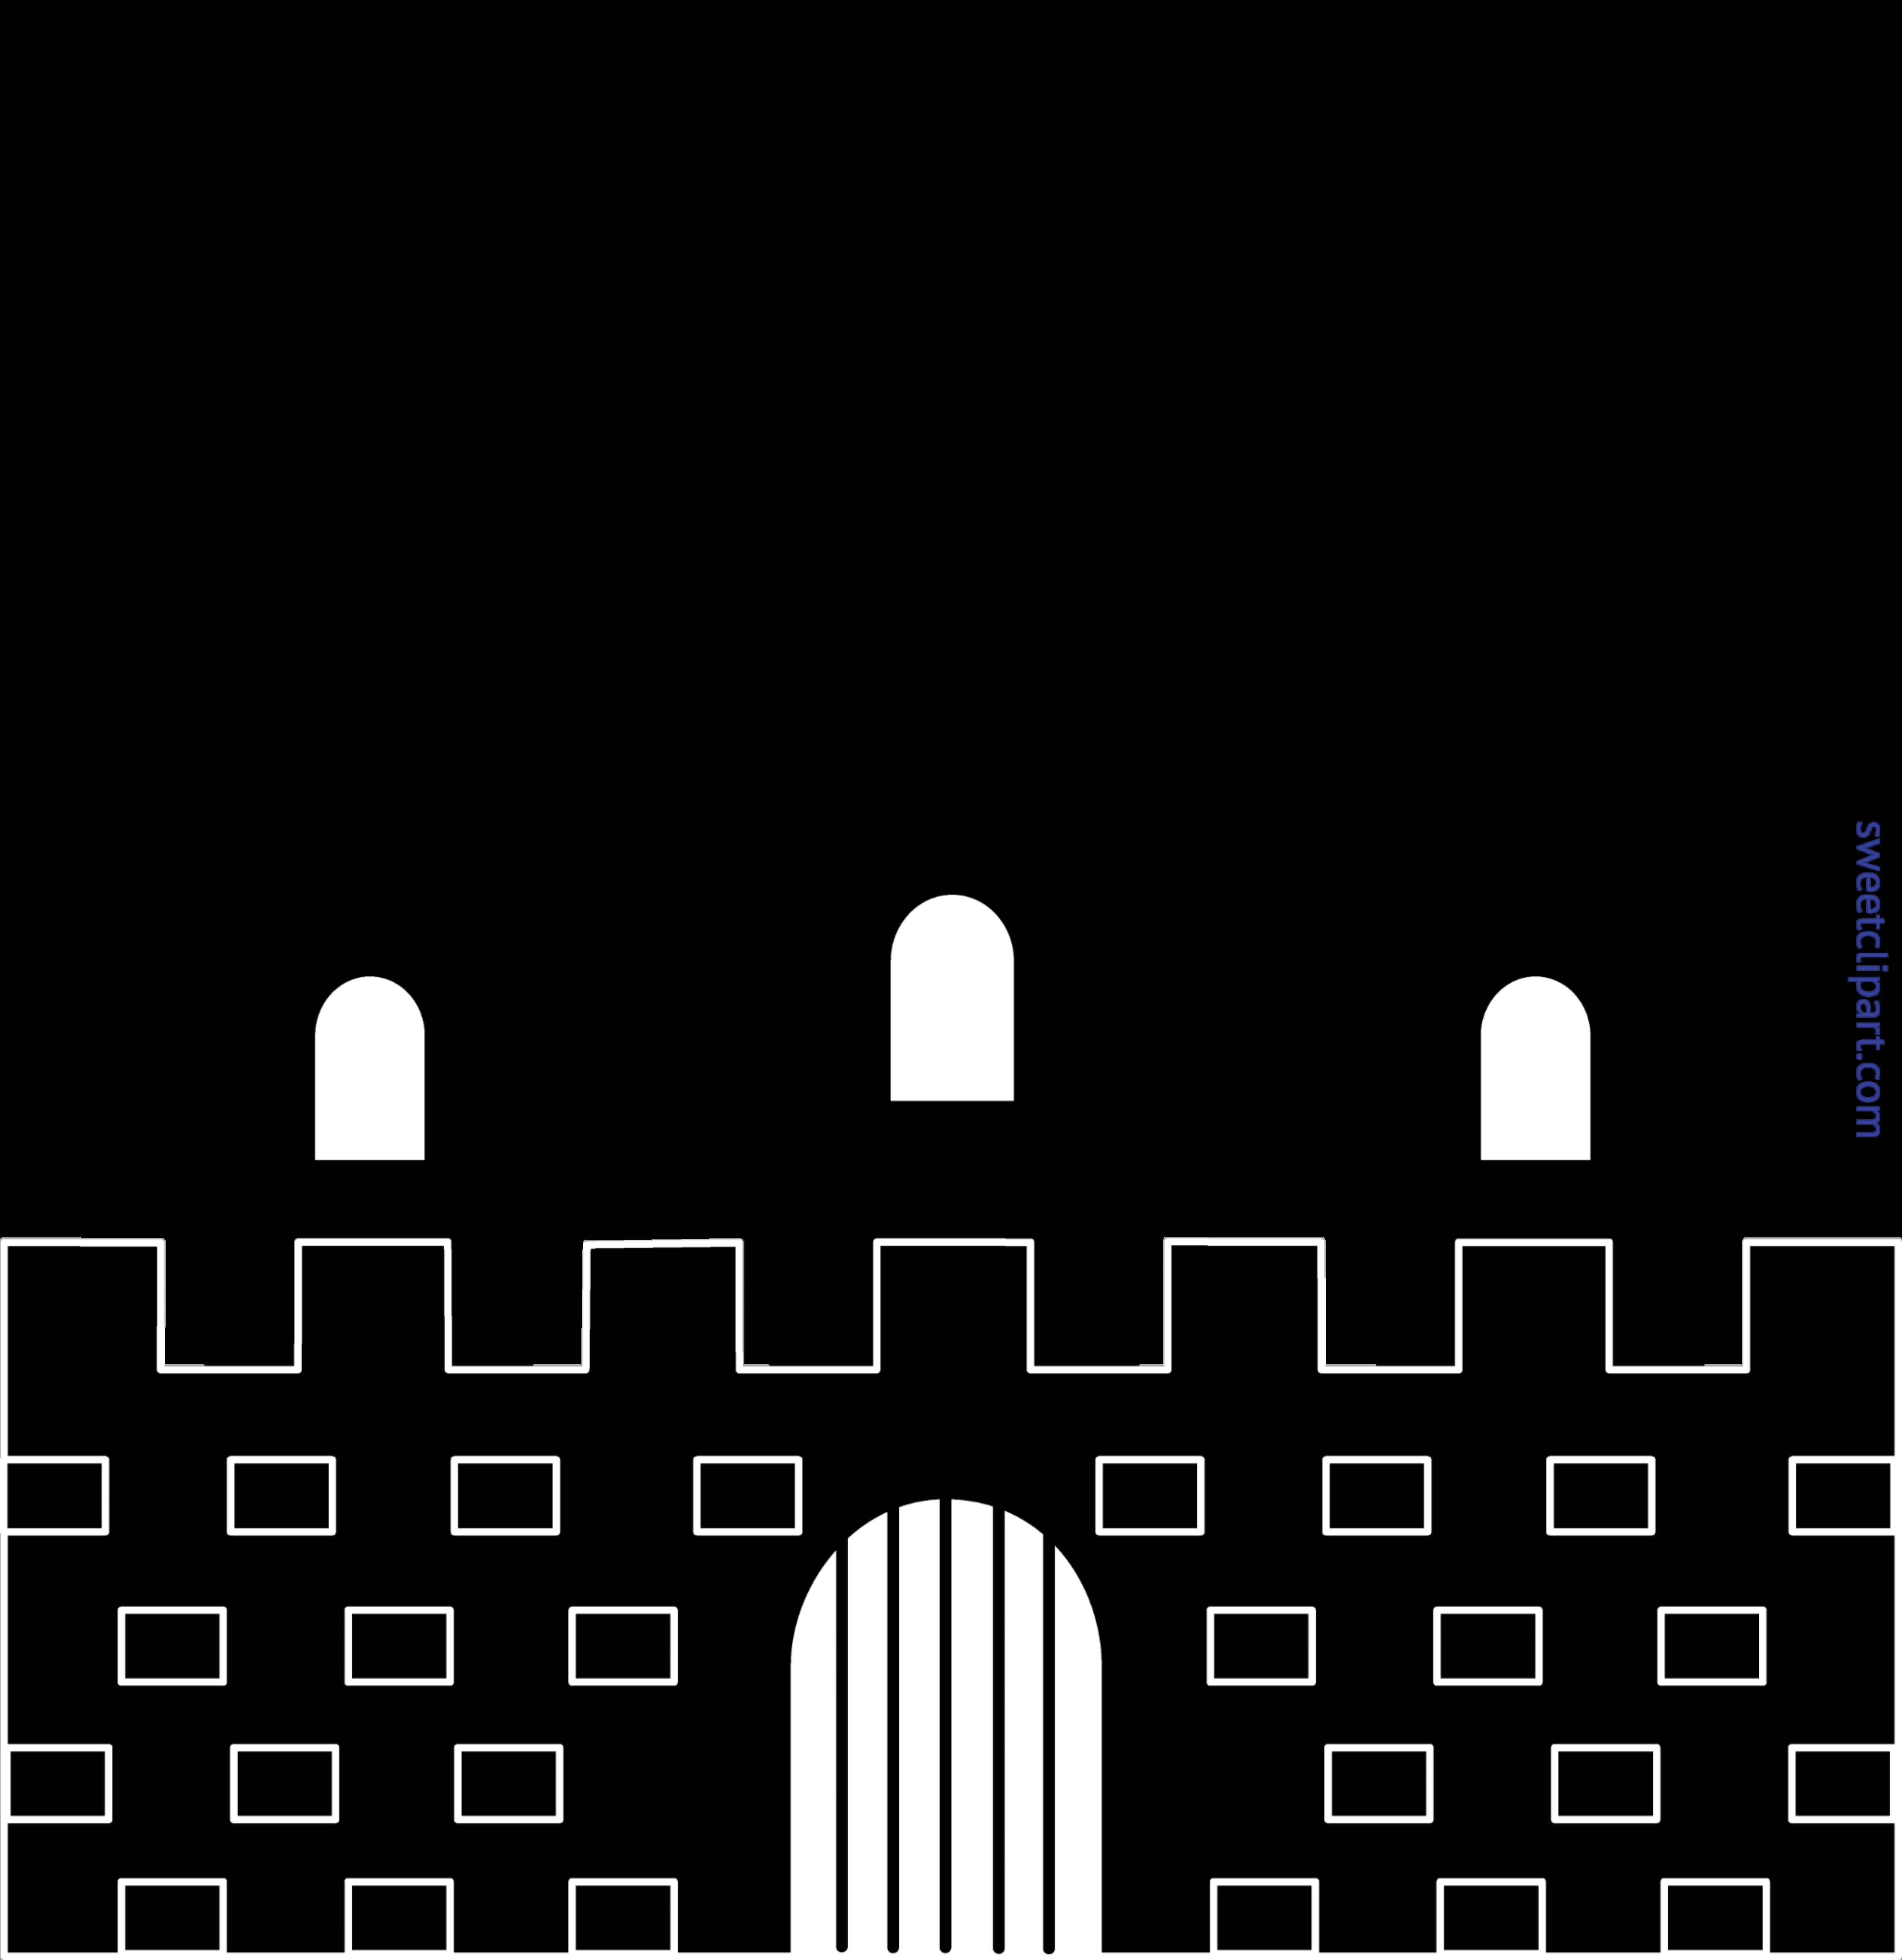 Clip art Openclipart Vector graphics Castle Image.